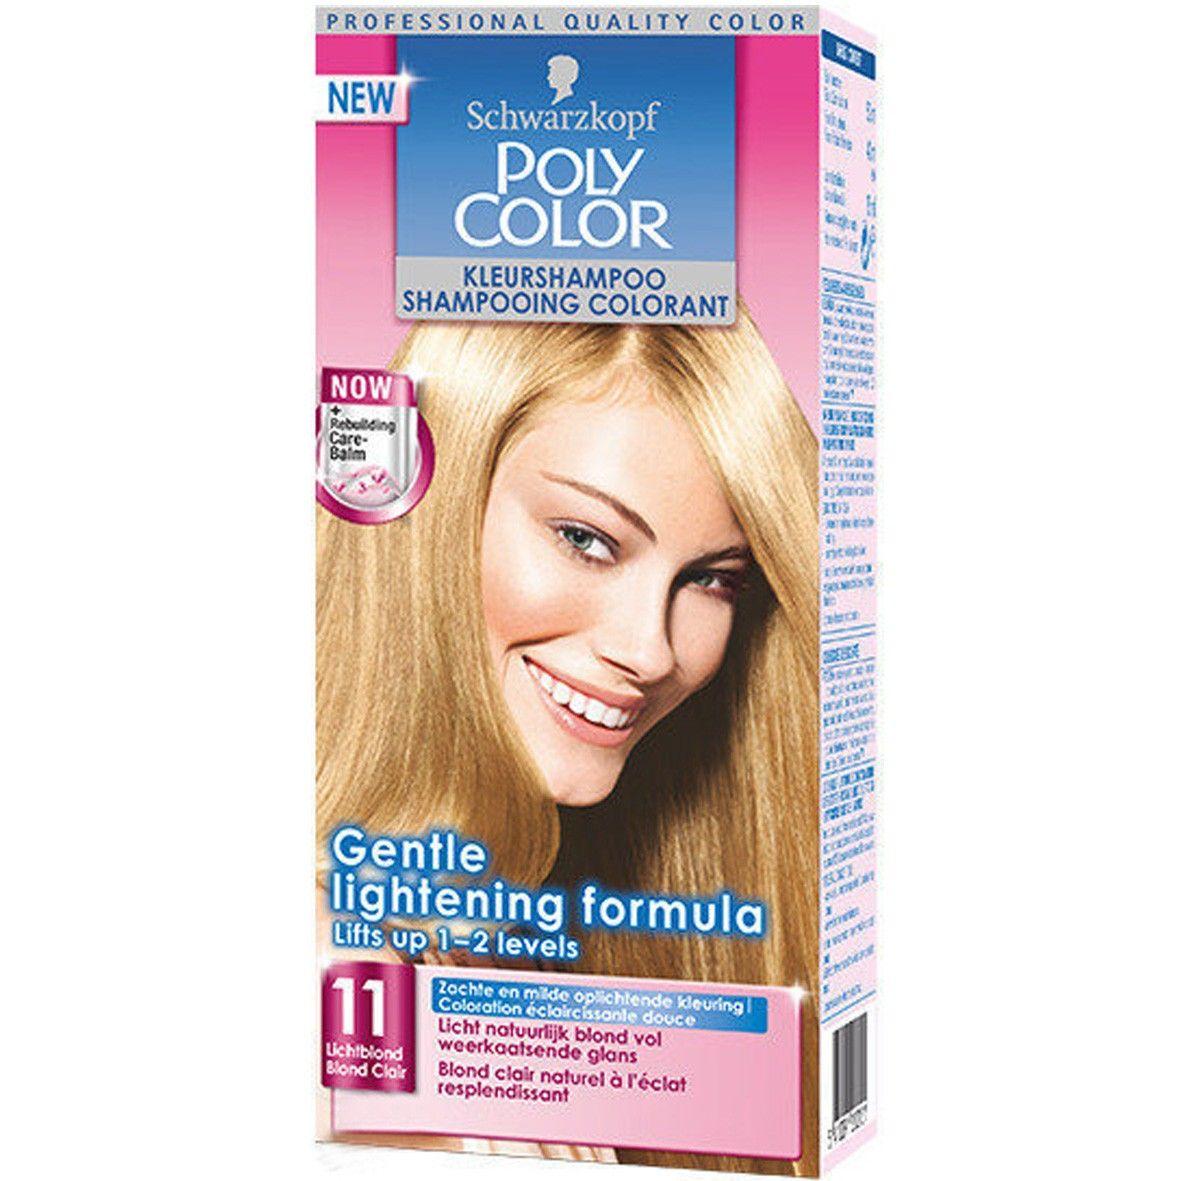 Schwarzkopf Poly Color Kleurshampoo